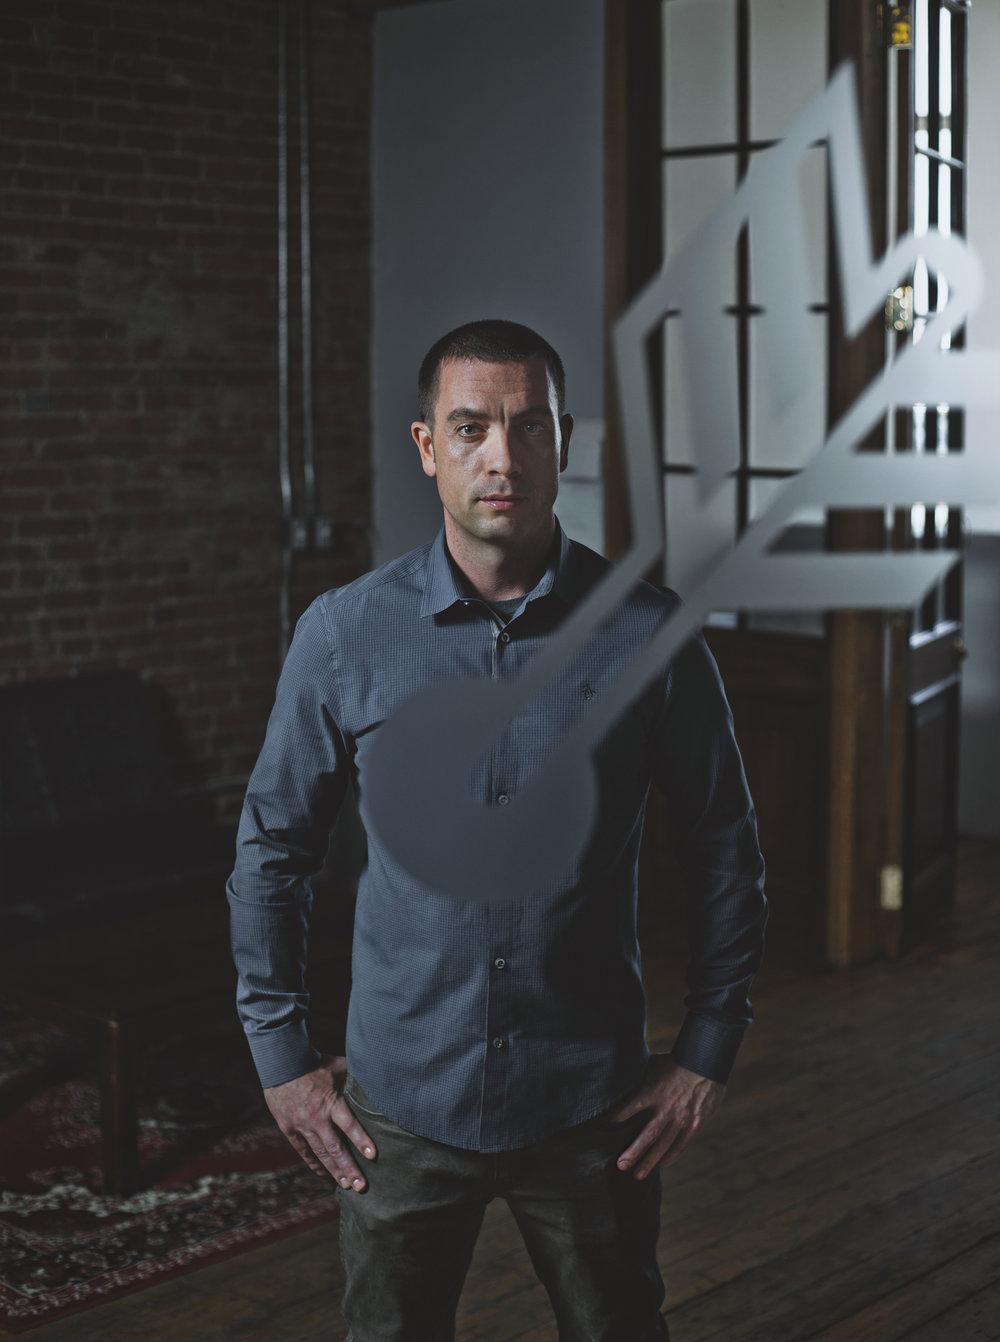 Hyprloco CEO Nic Gray